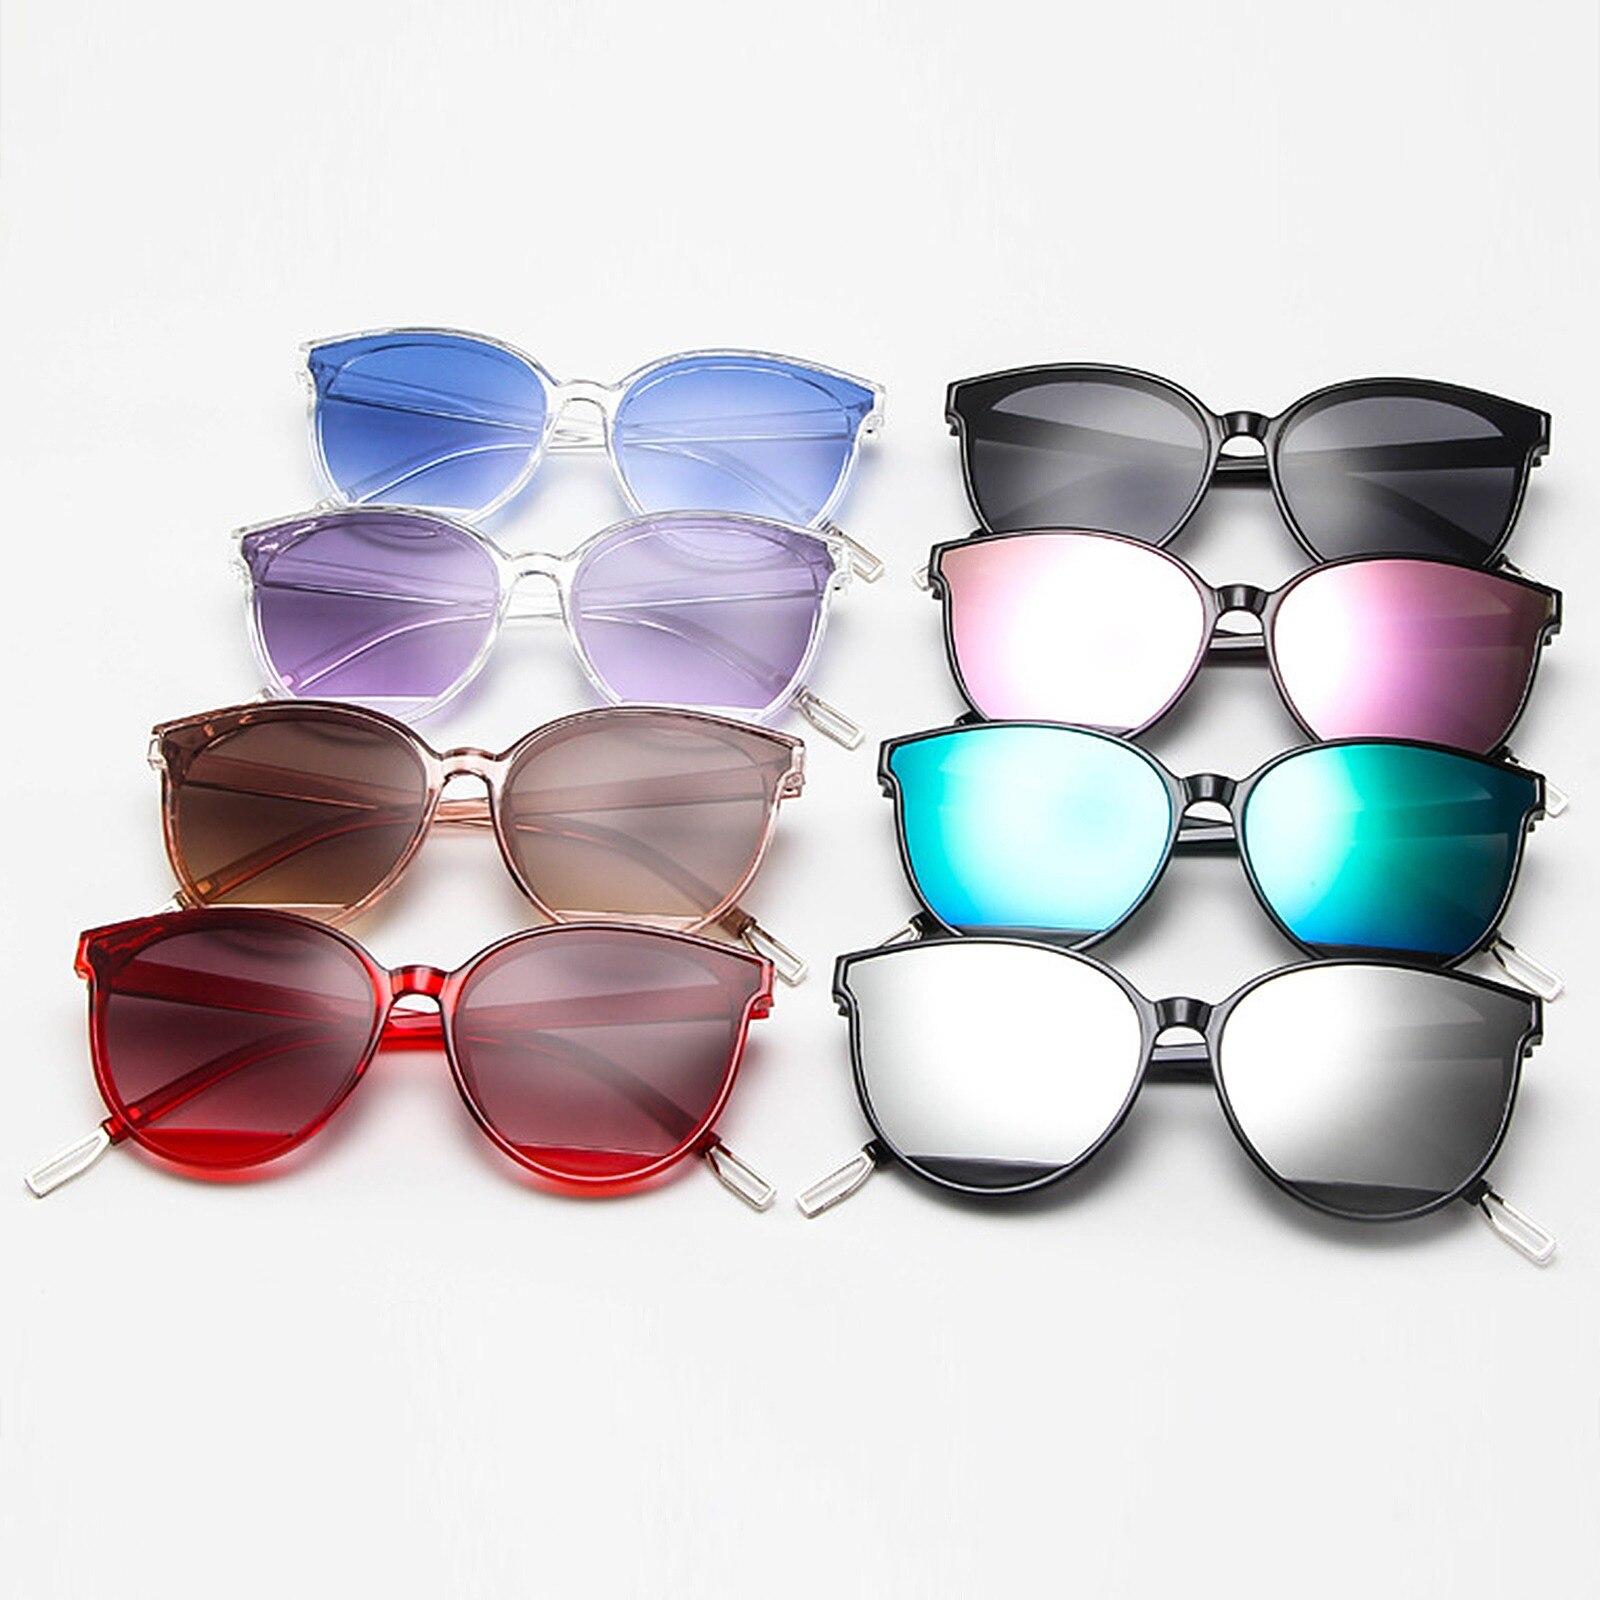 2021 New Arrival Fashion Sunglasses Women Vintage Metal Mirror Classic Vintage Women's Glasses Femal